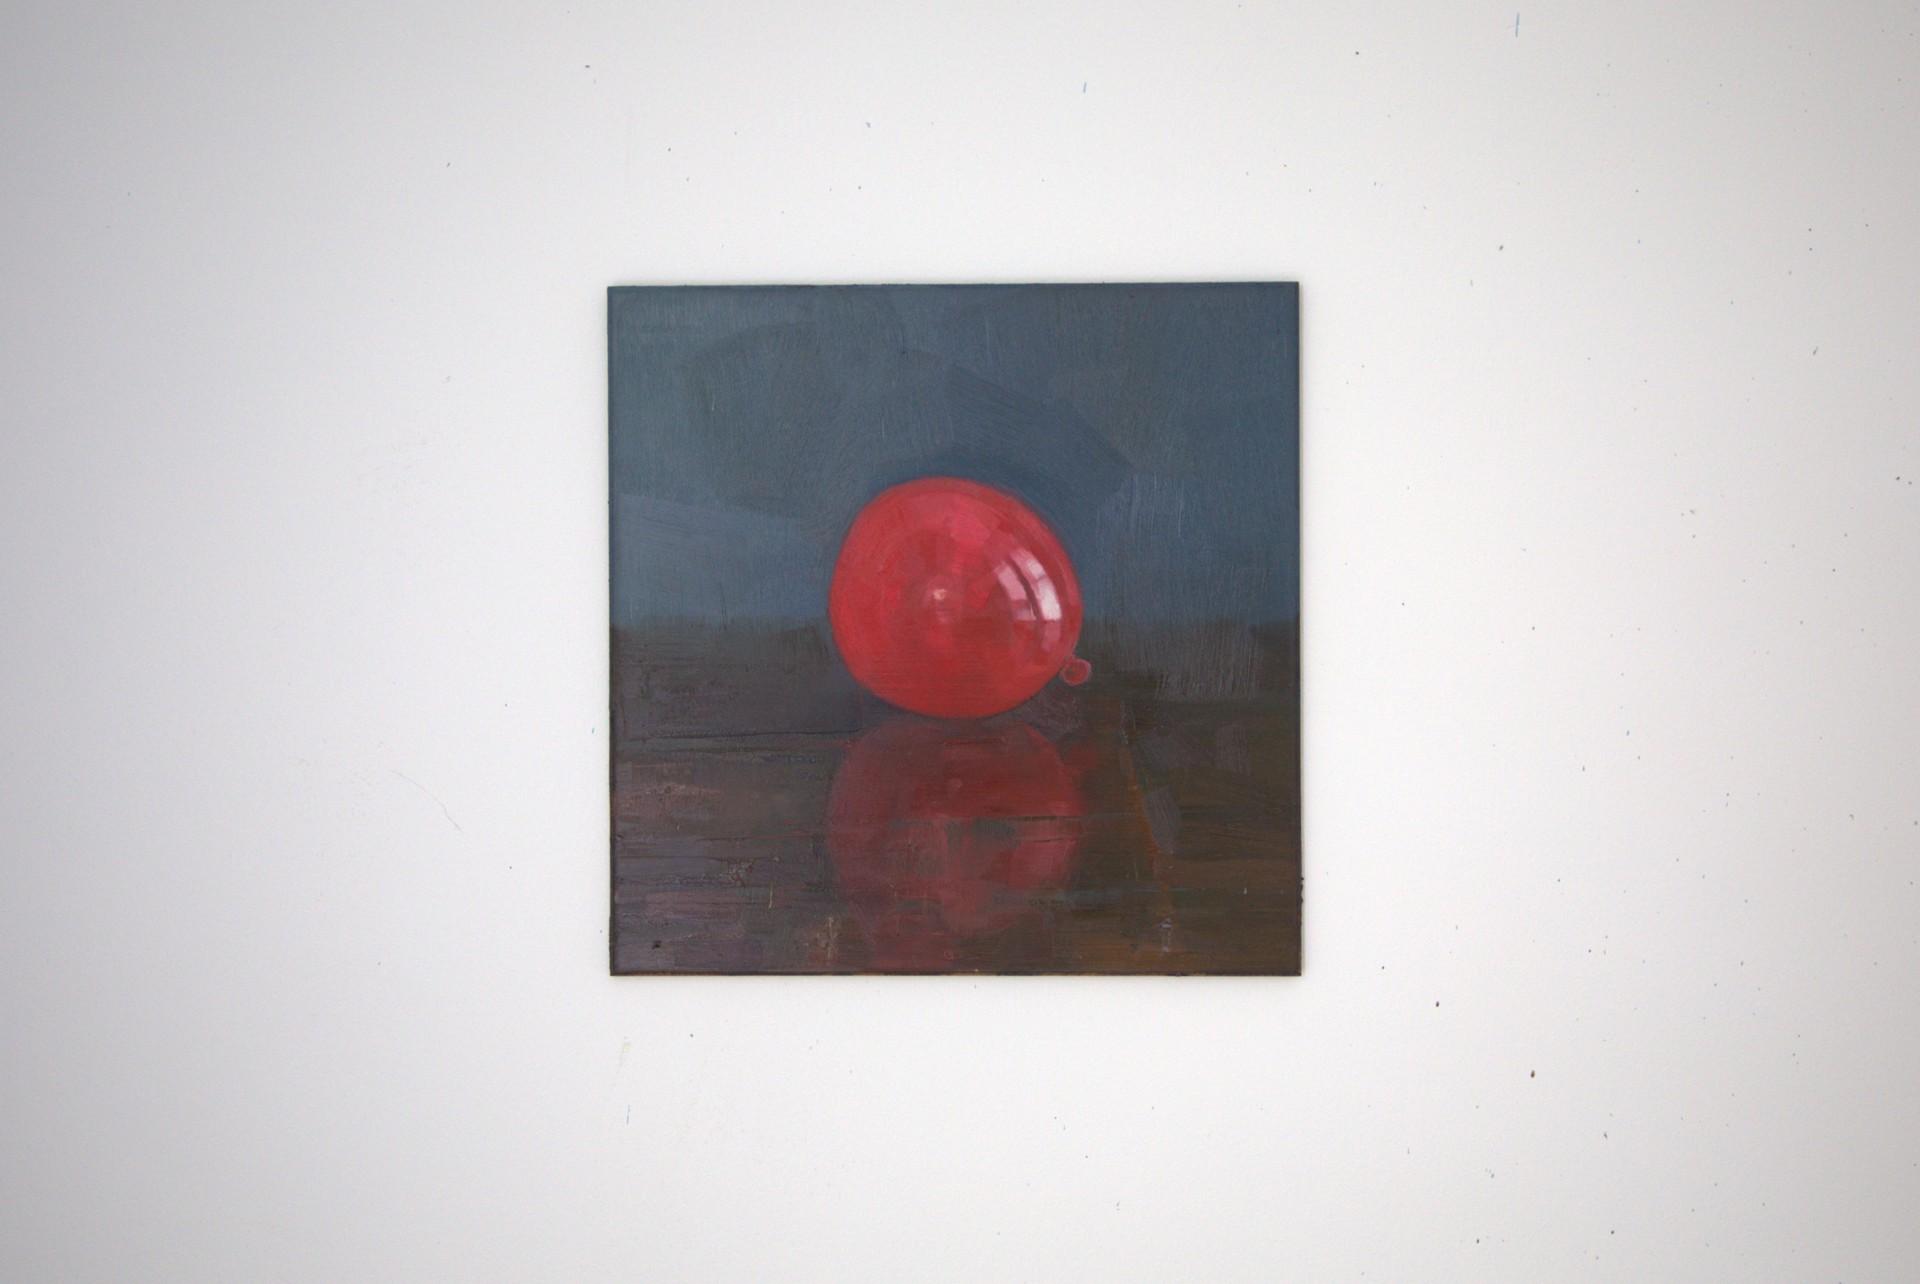 Red Dot by Elena Burykina